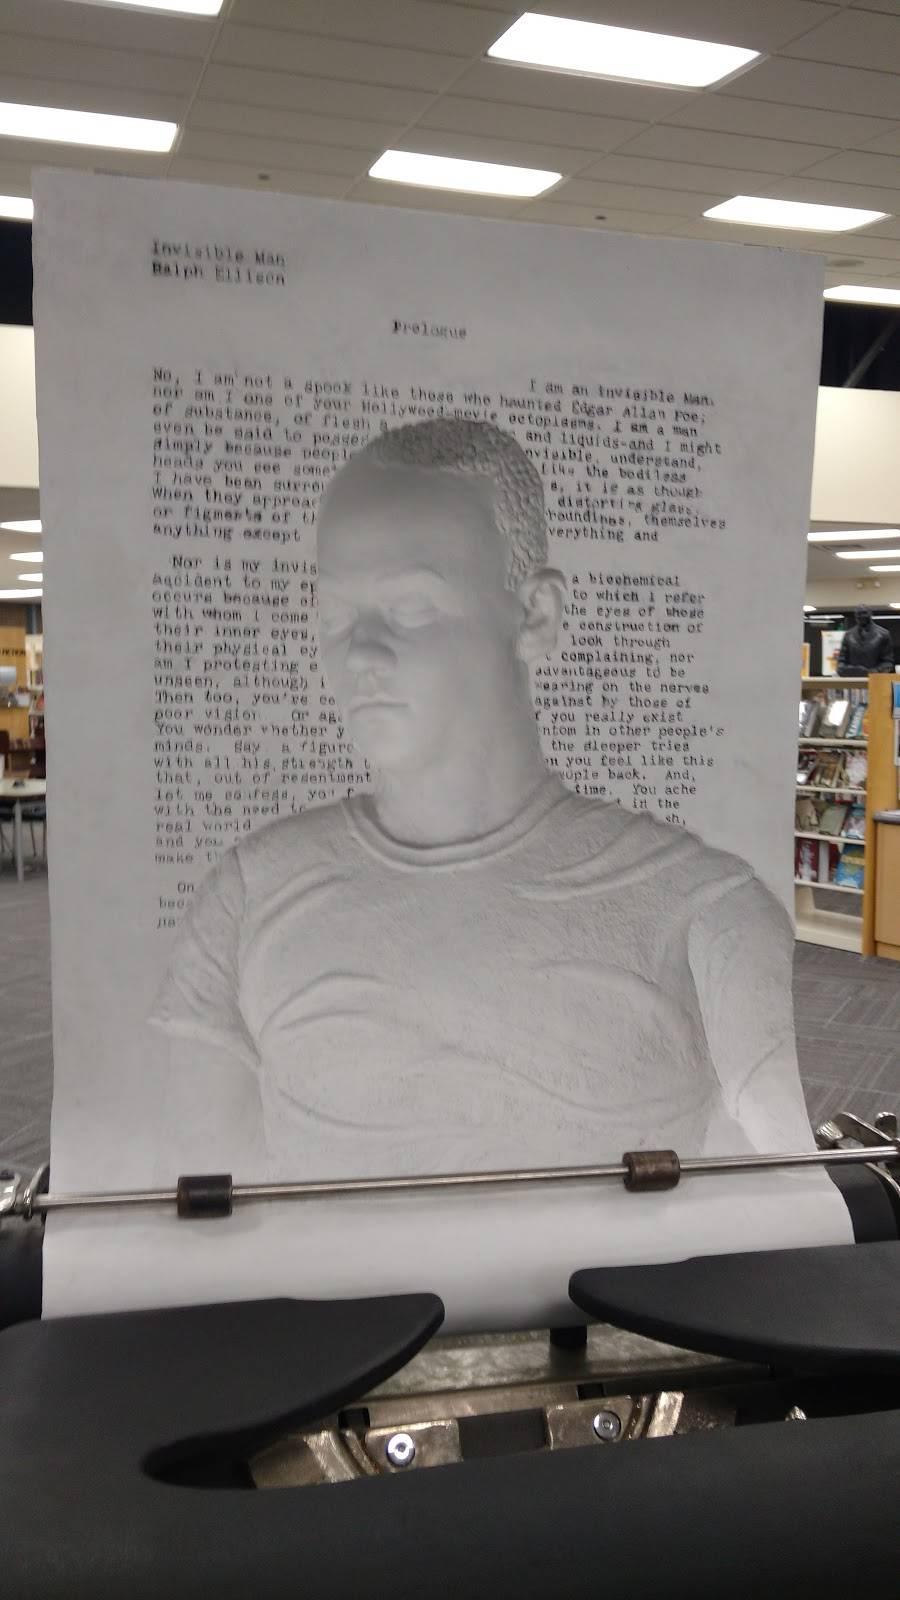 Metropolitan Library System - Ralph Ellison Library - library  | Photo 4 of 7 | Address: 2000 NE 23rd St, Oklahoma City, OK 73111, USA | Phone: (405) 424-1437